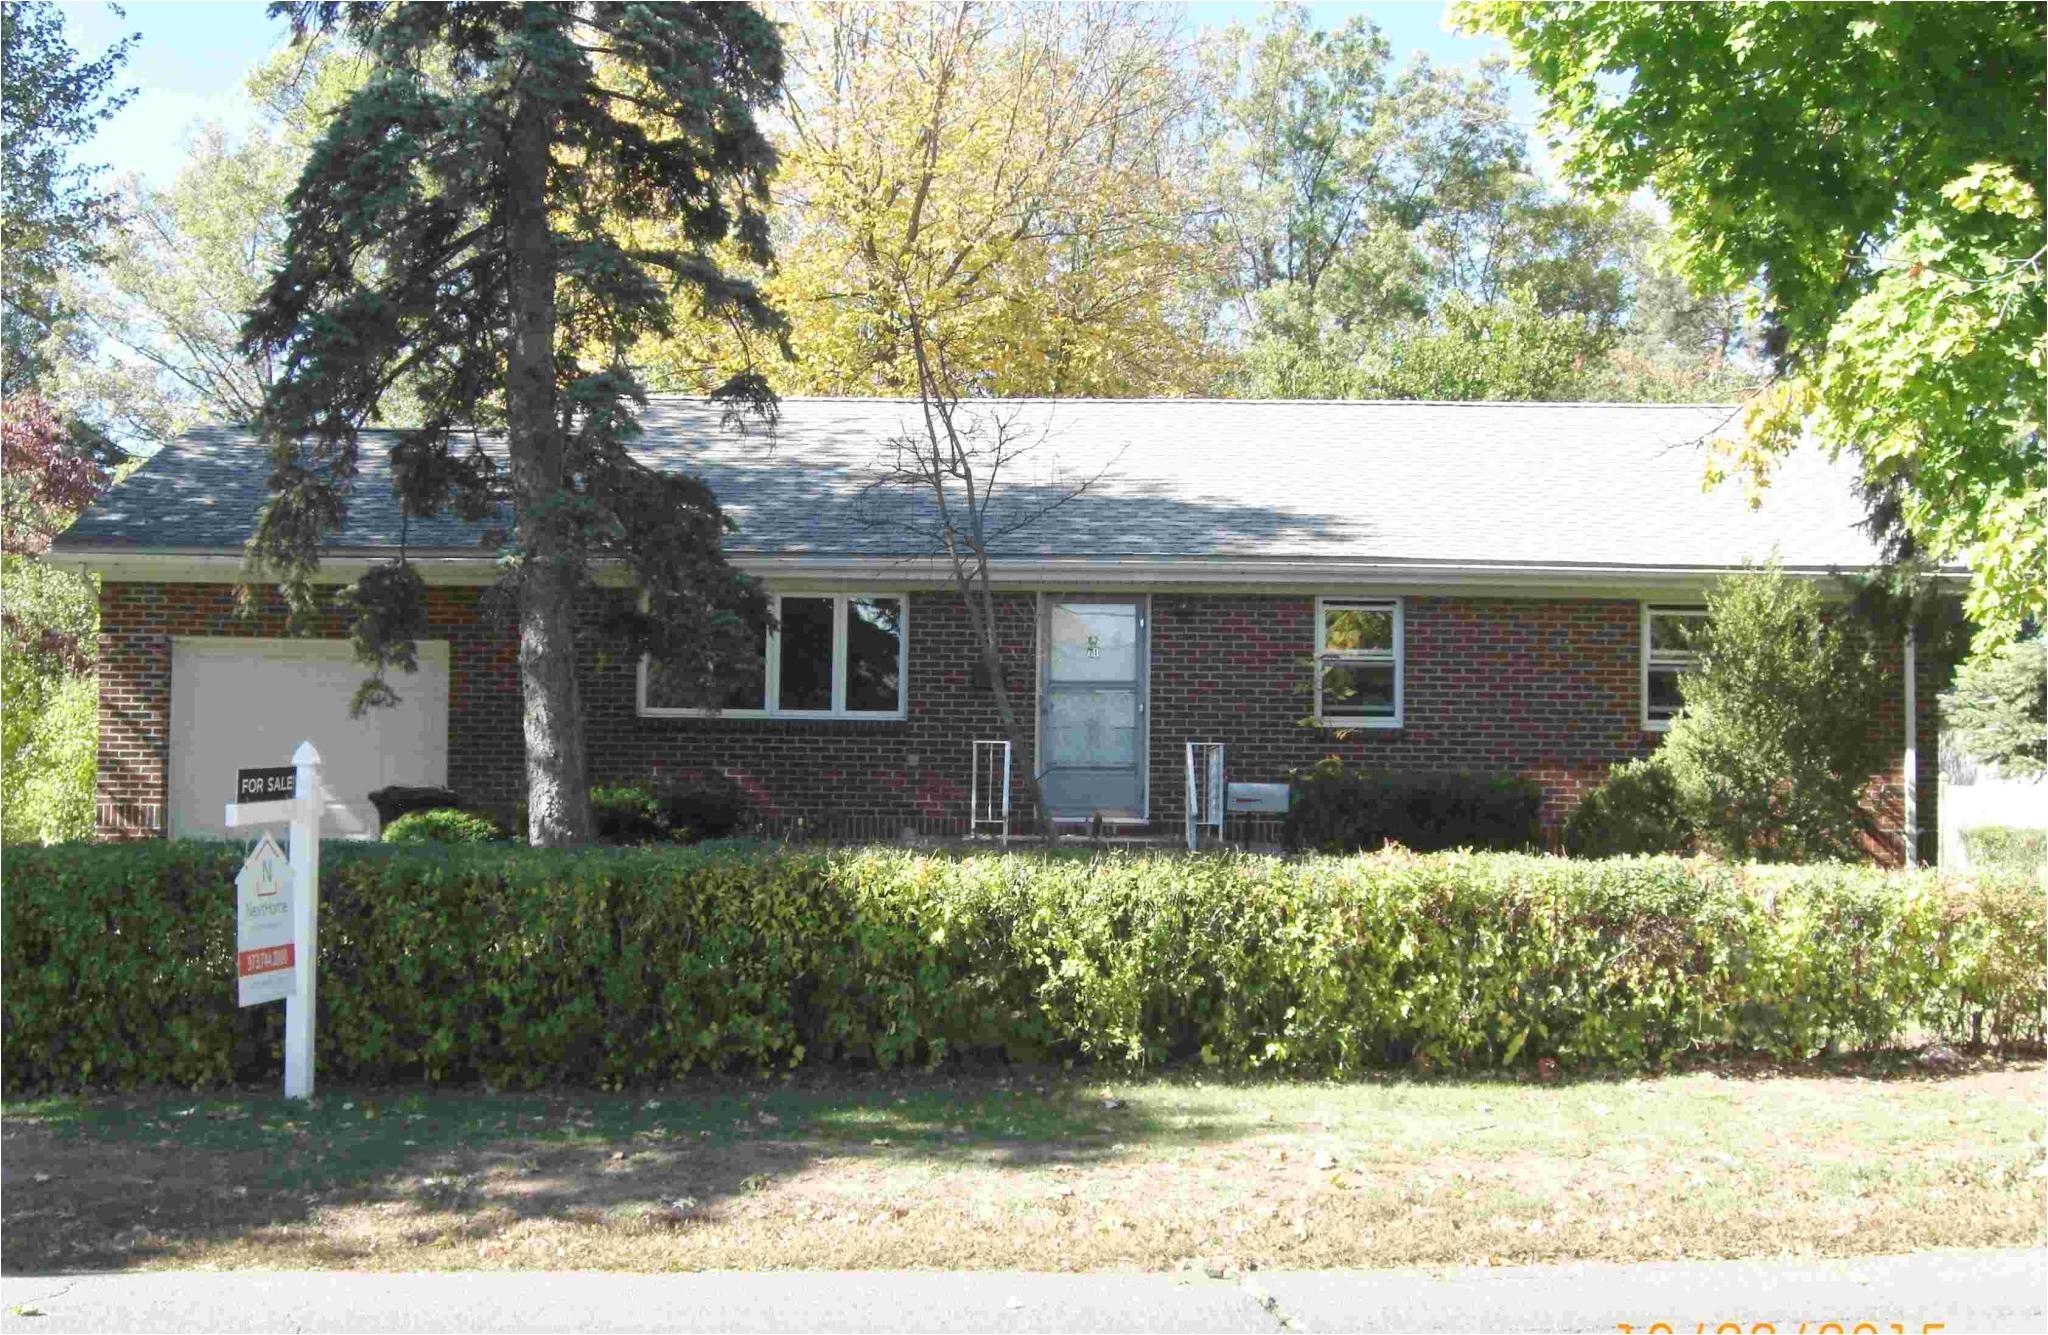 Homes for Sale In iselin Nj 71 Magnolia Rd iselin Nj 08830 Trulia